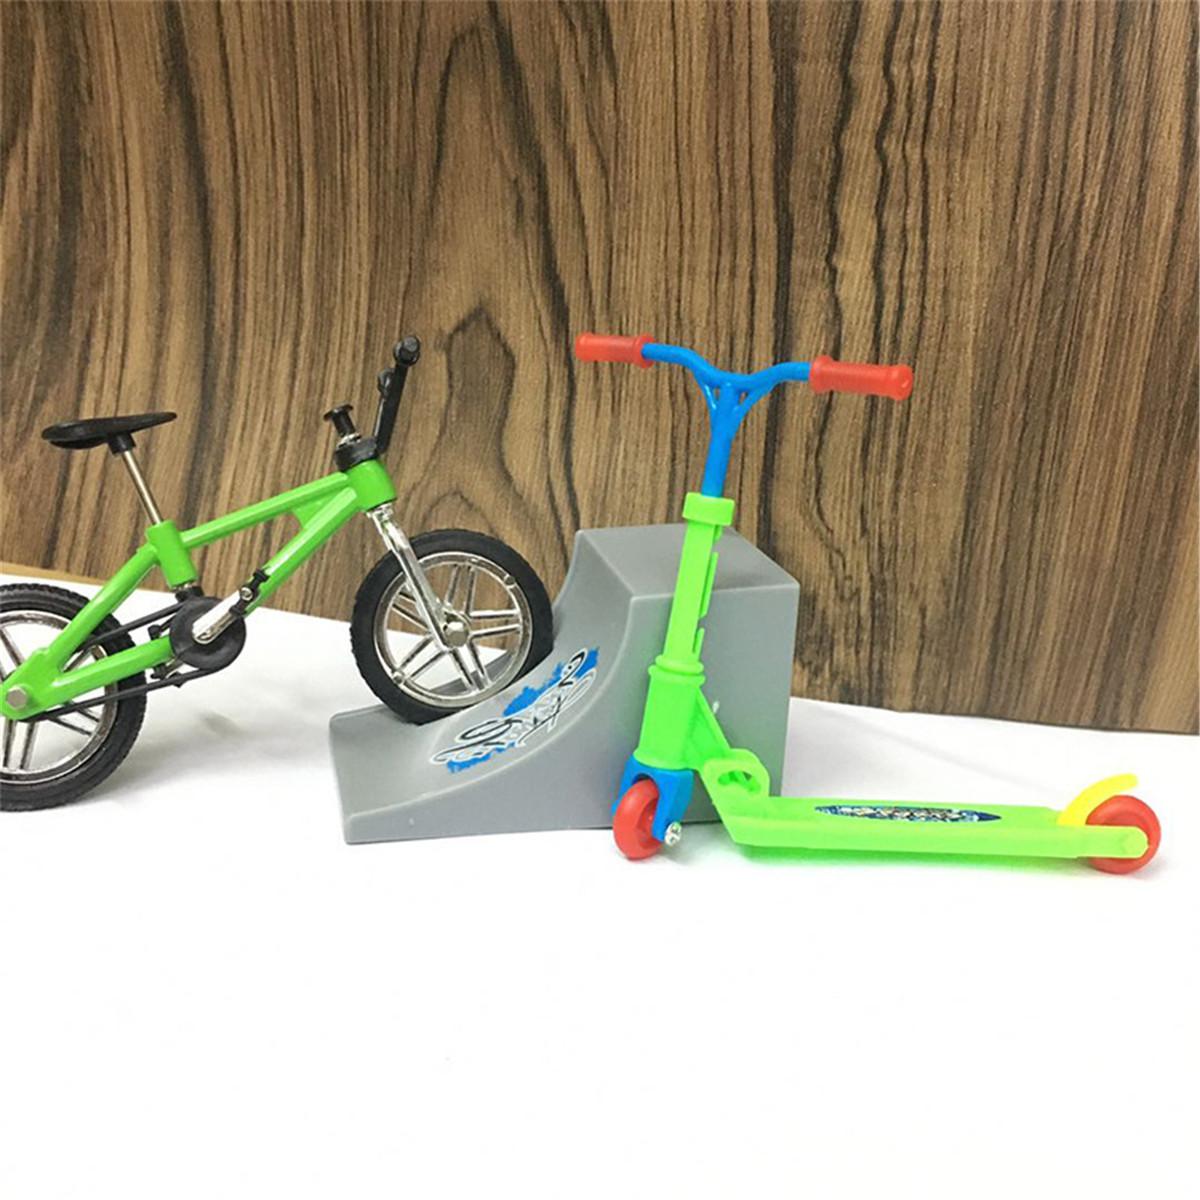 Toys & Games Novelty & Gag Toys Lergo Mini Scooter Childrens ...